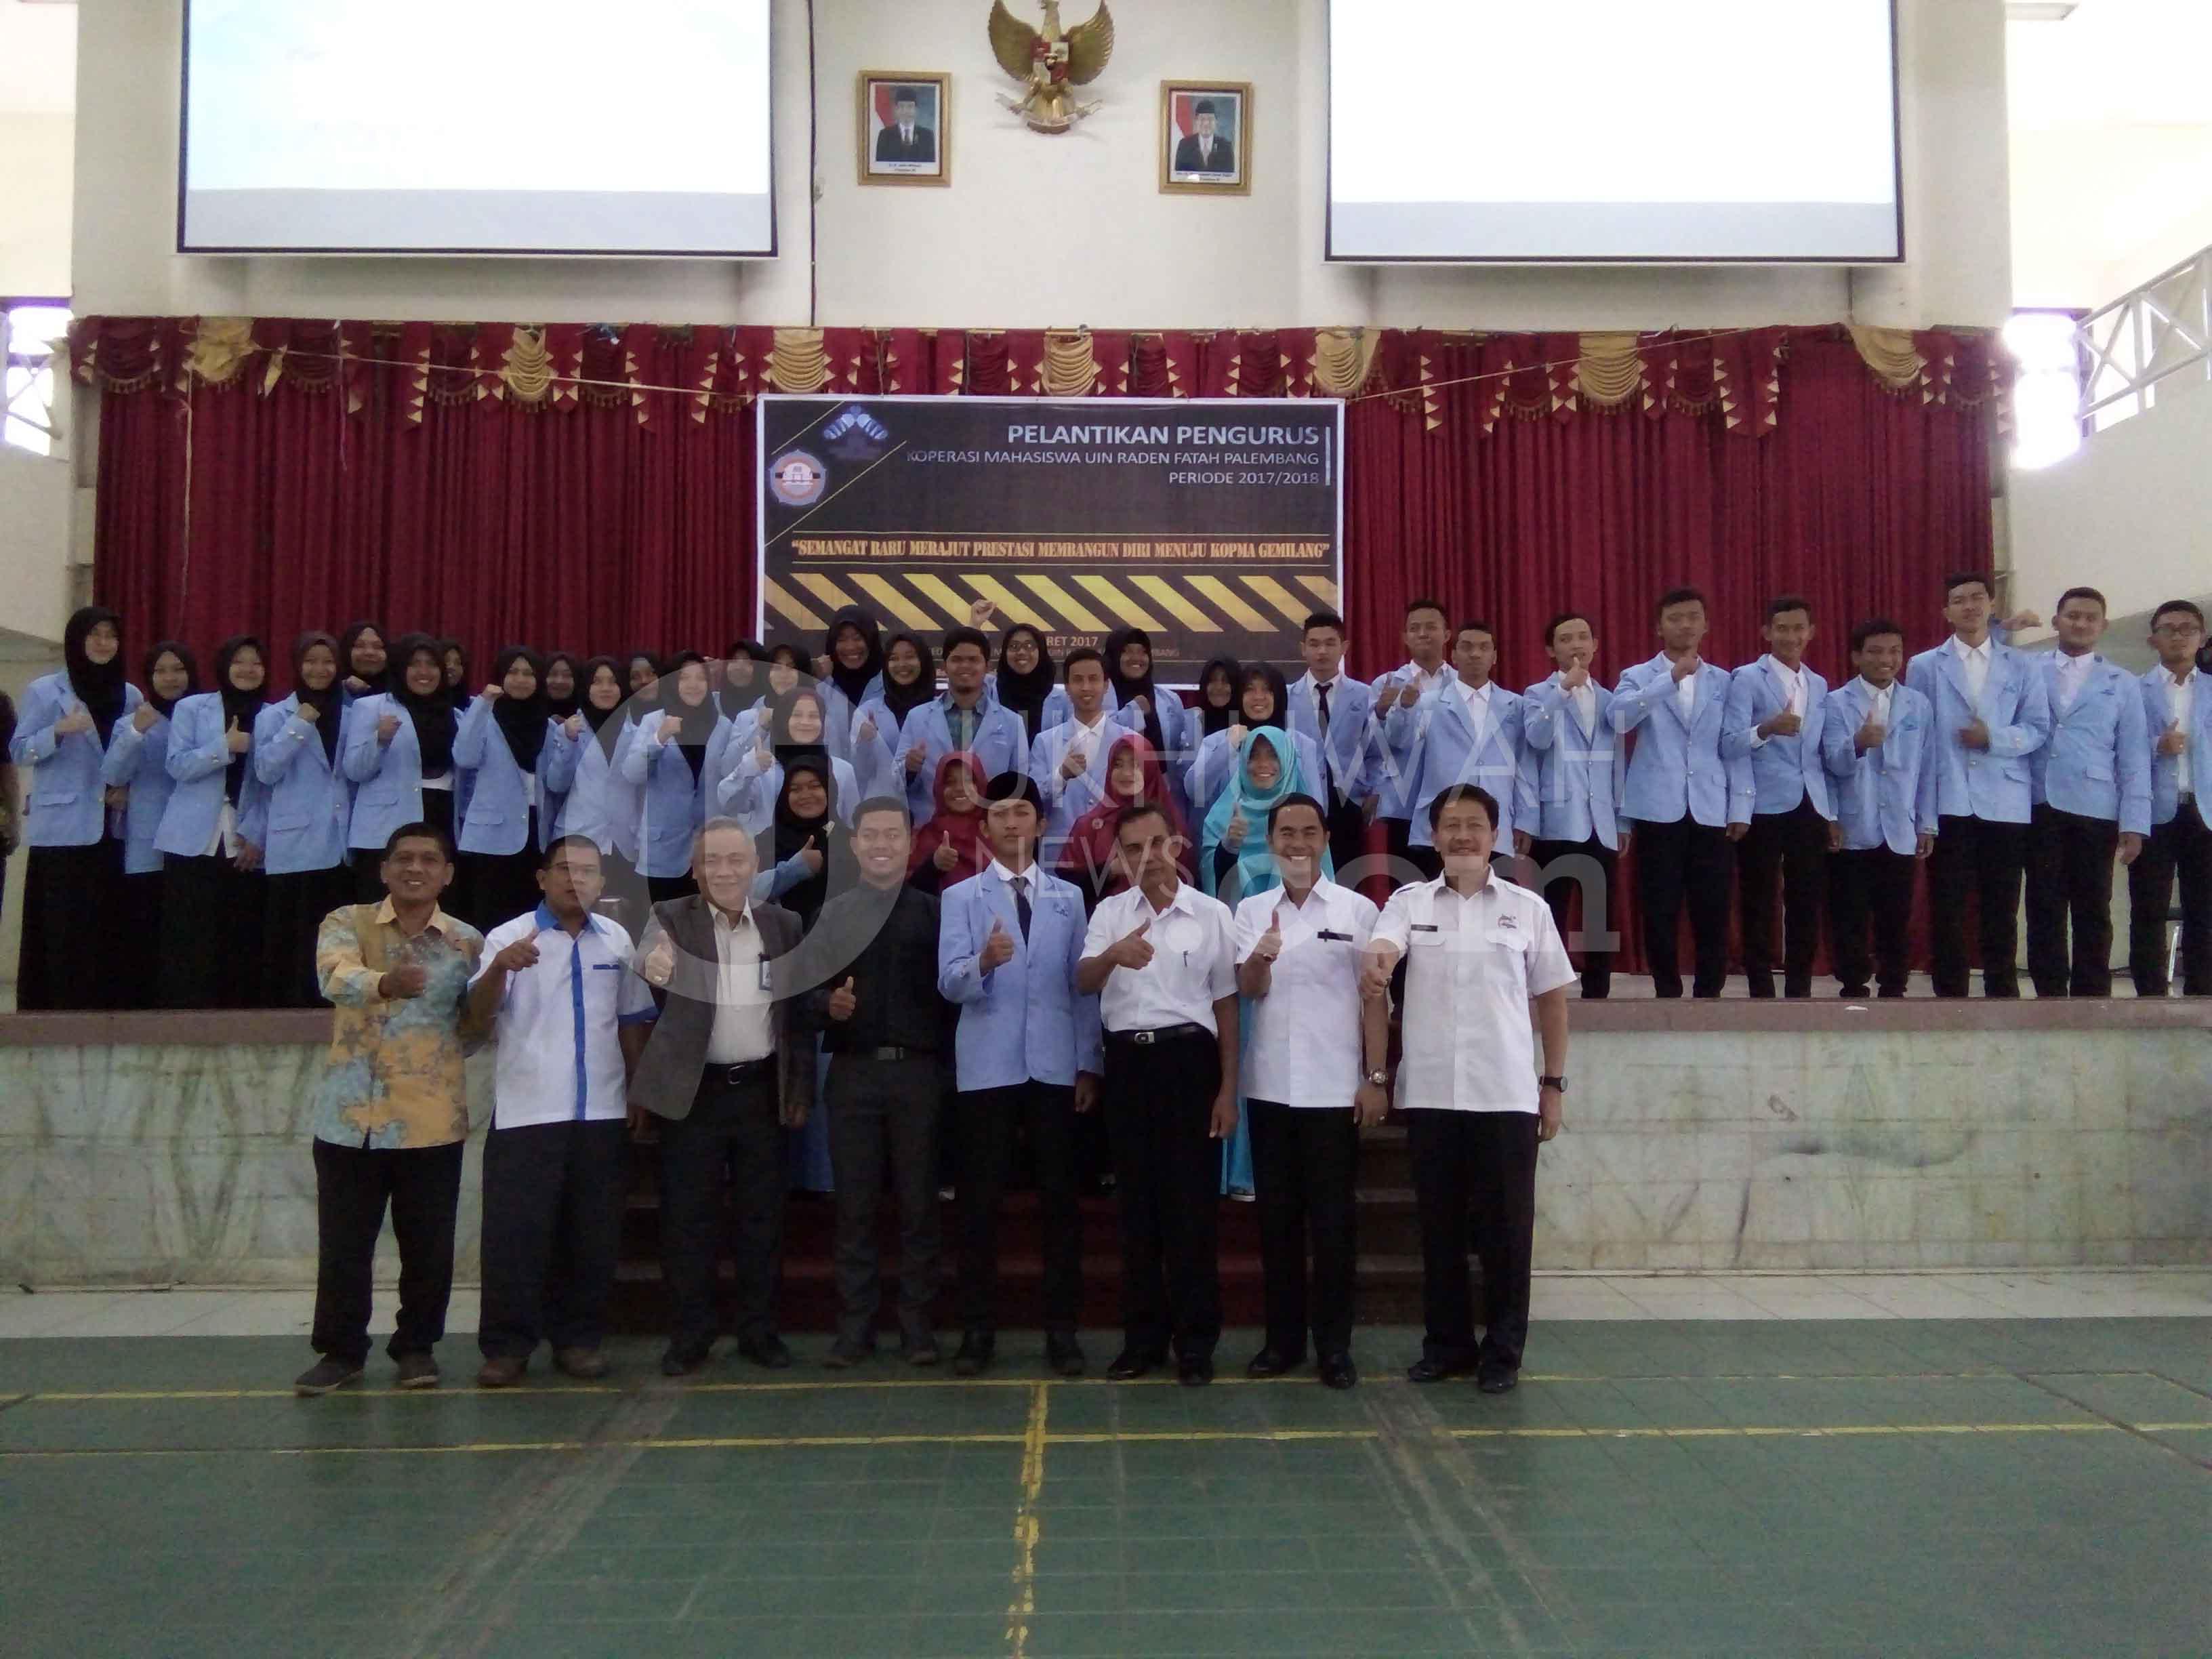 Foto seluruh anggota dan kepengurusan baru Kopma, bersama Wakil Rektor II UIN RF, Dr. Zainal Berlian, S.H., MM., DBA. Di gedung Academic Center UIN RF. Palembang, Rabu, (01/03/17). Ukhuwahnews.com/Erna